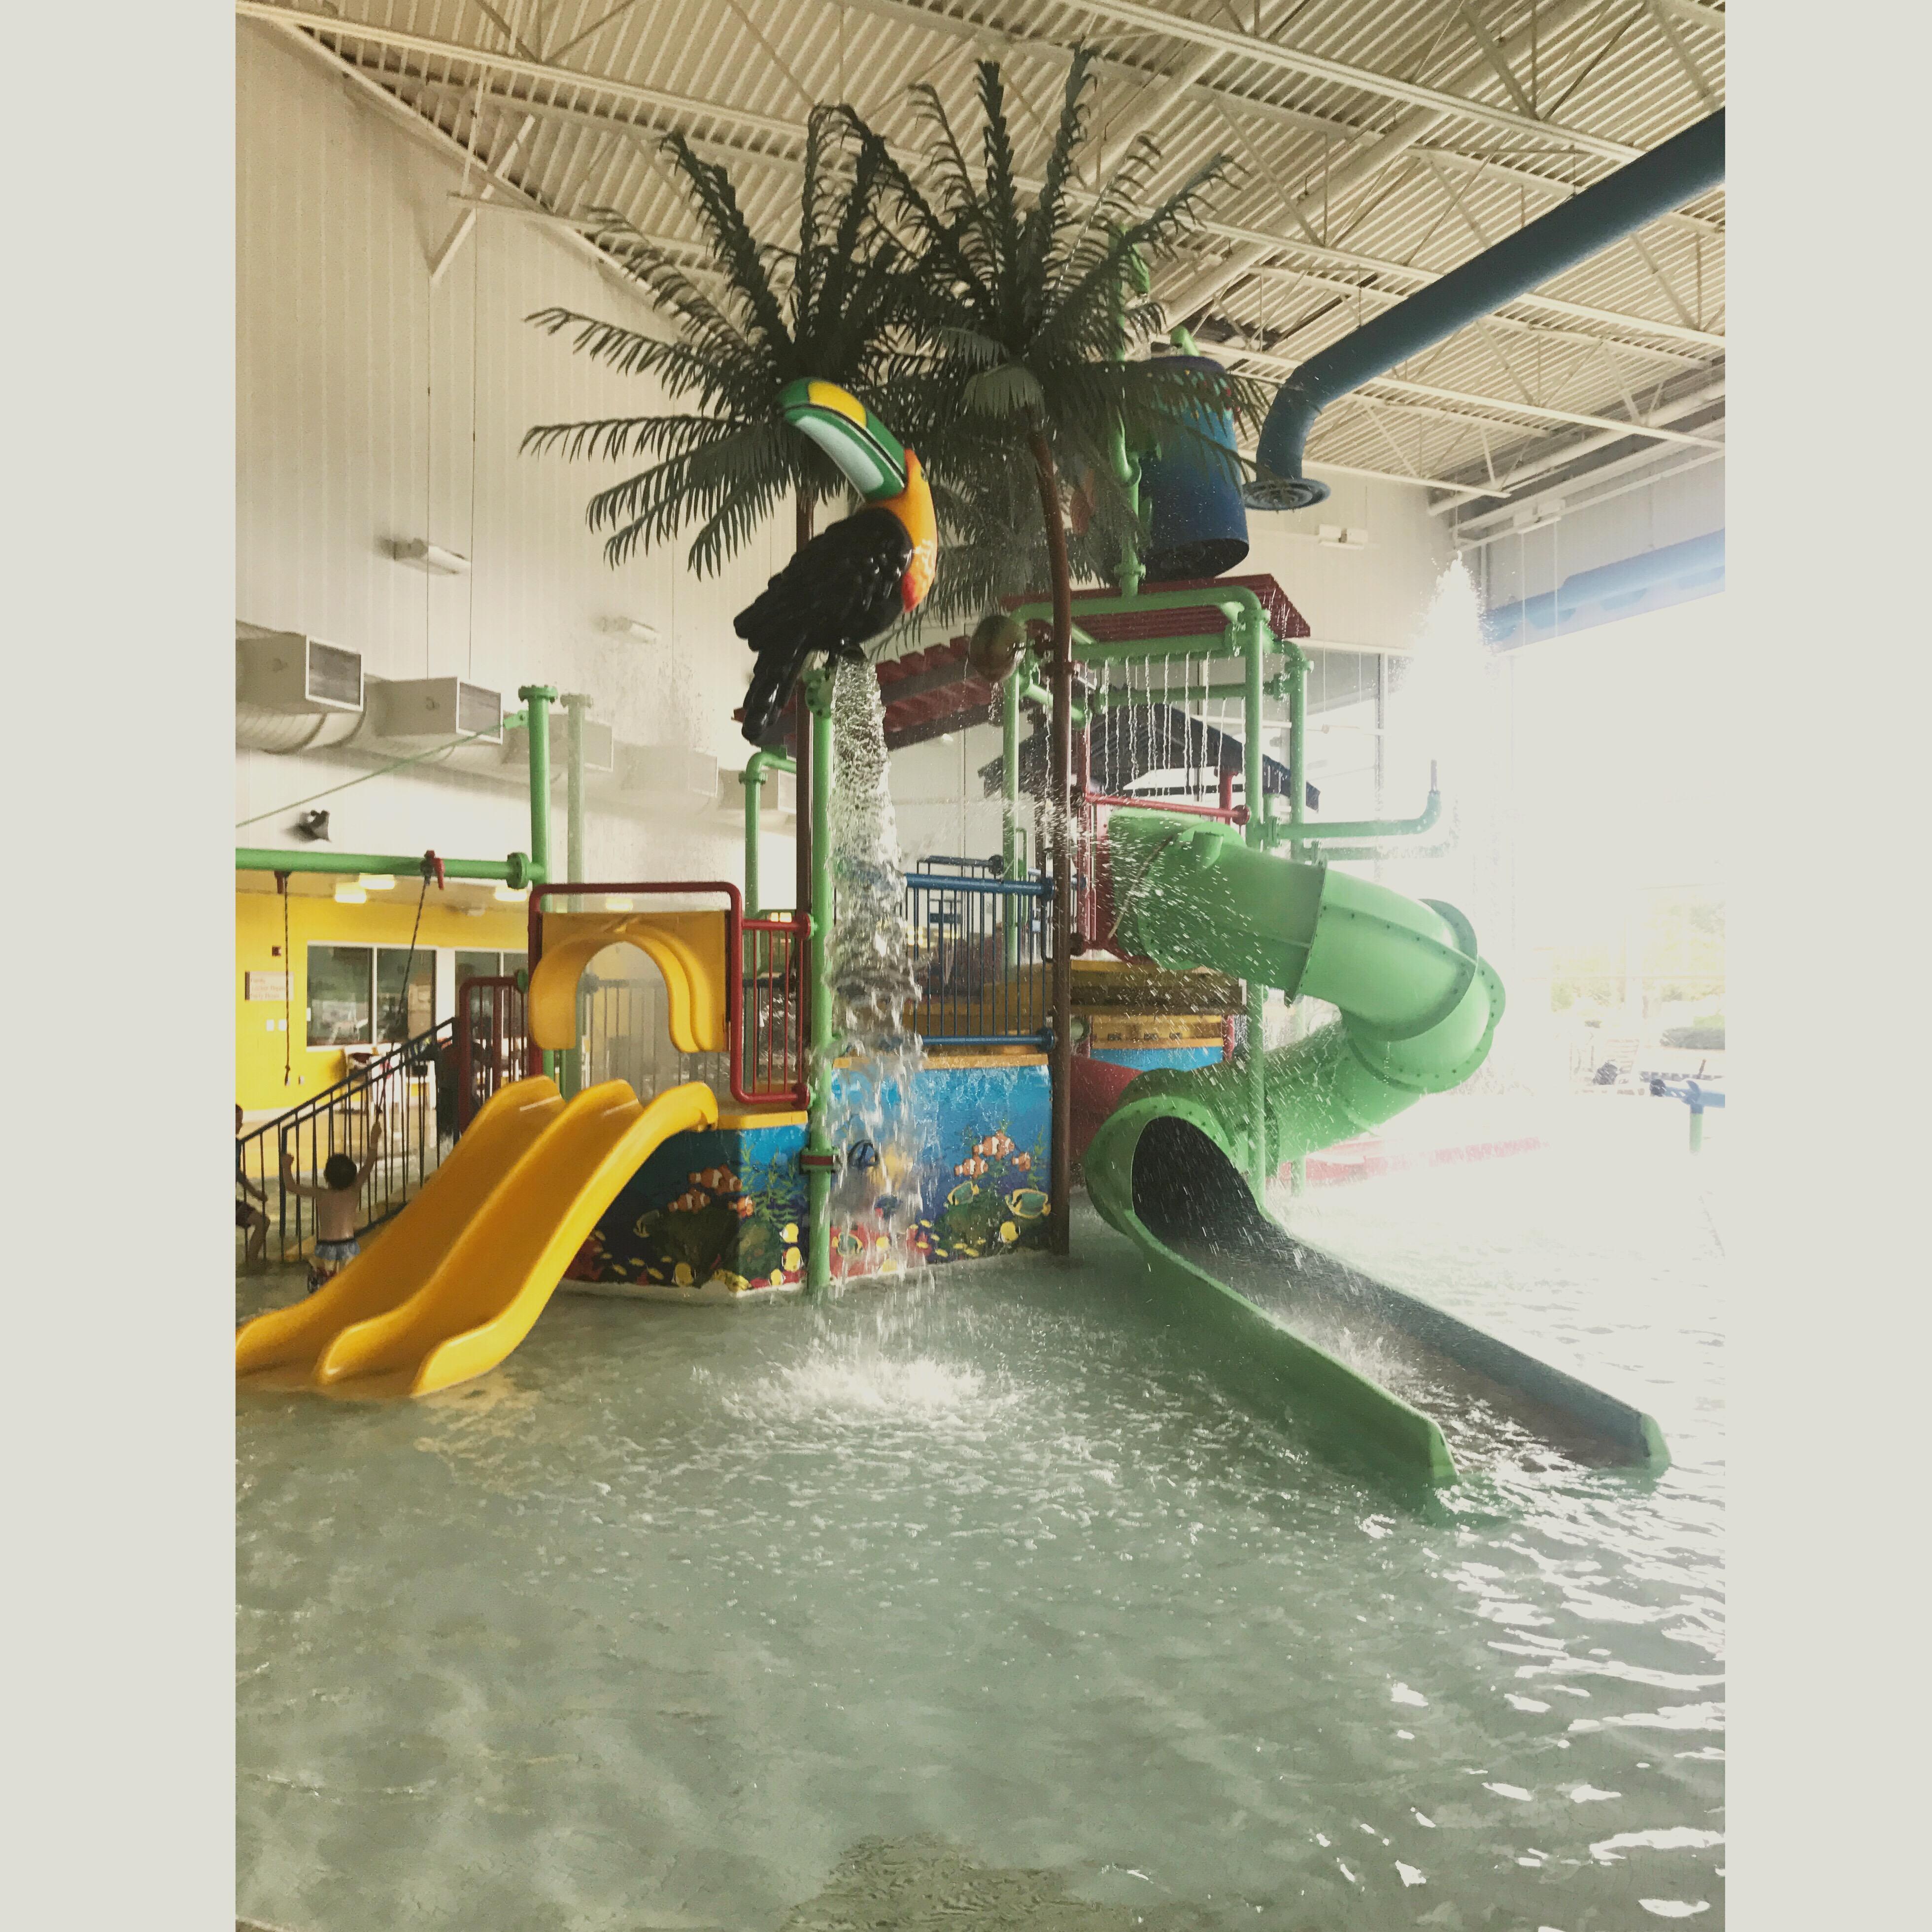 Warren community center indoor water park fall and winter birthday venue detroit mommies for Winter garden recreation center